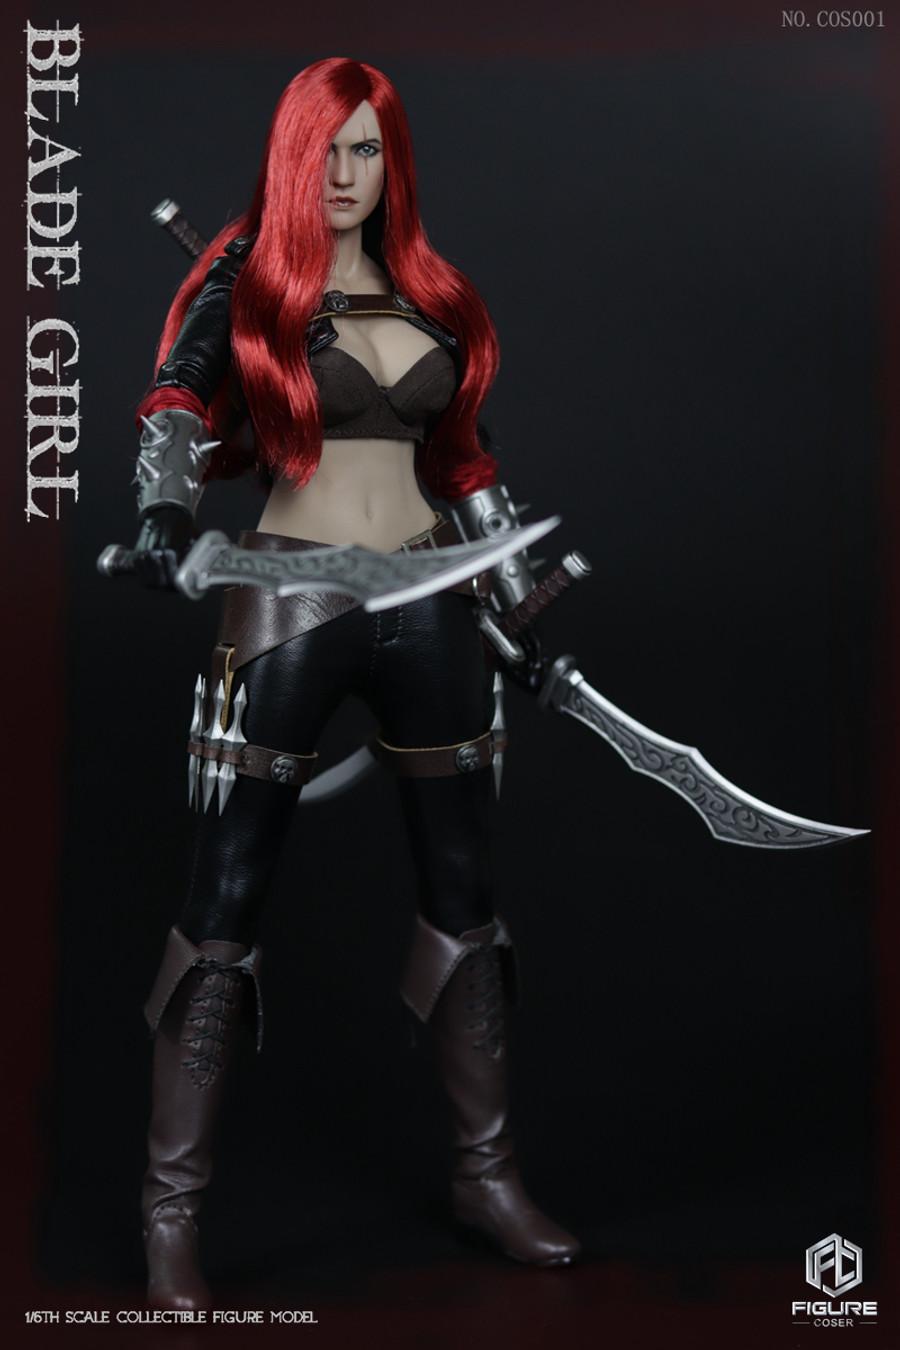 Figure Coser - Blade Girl